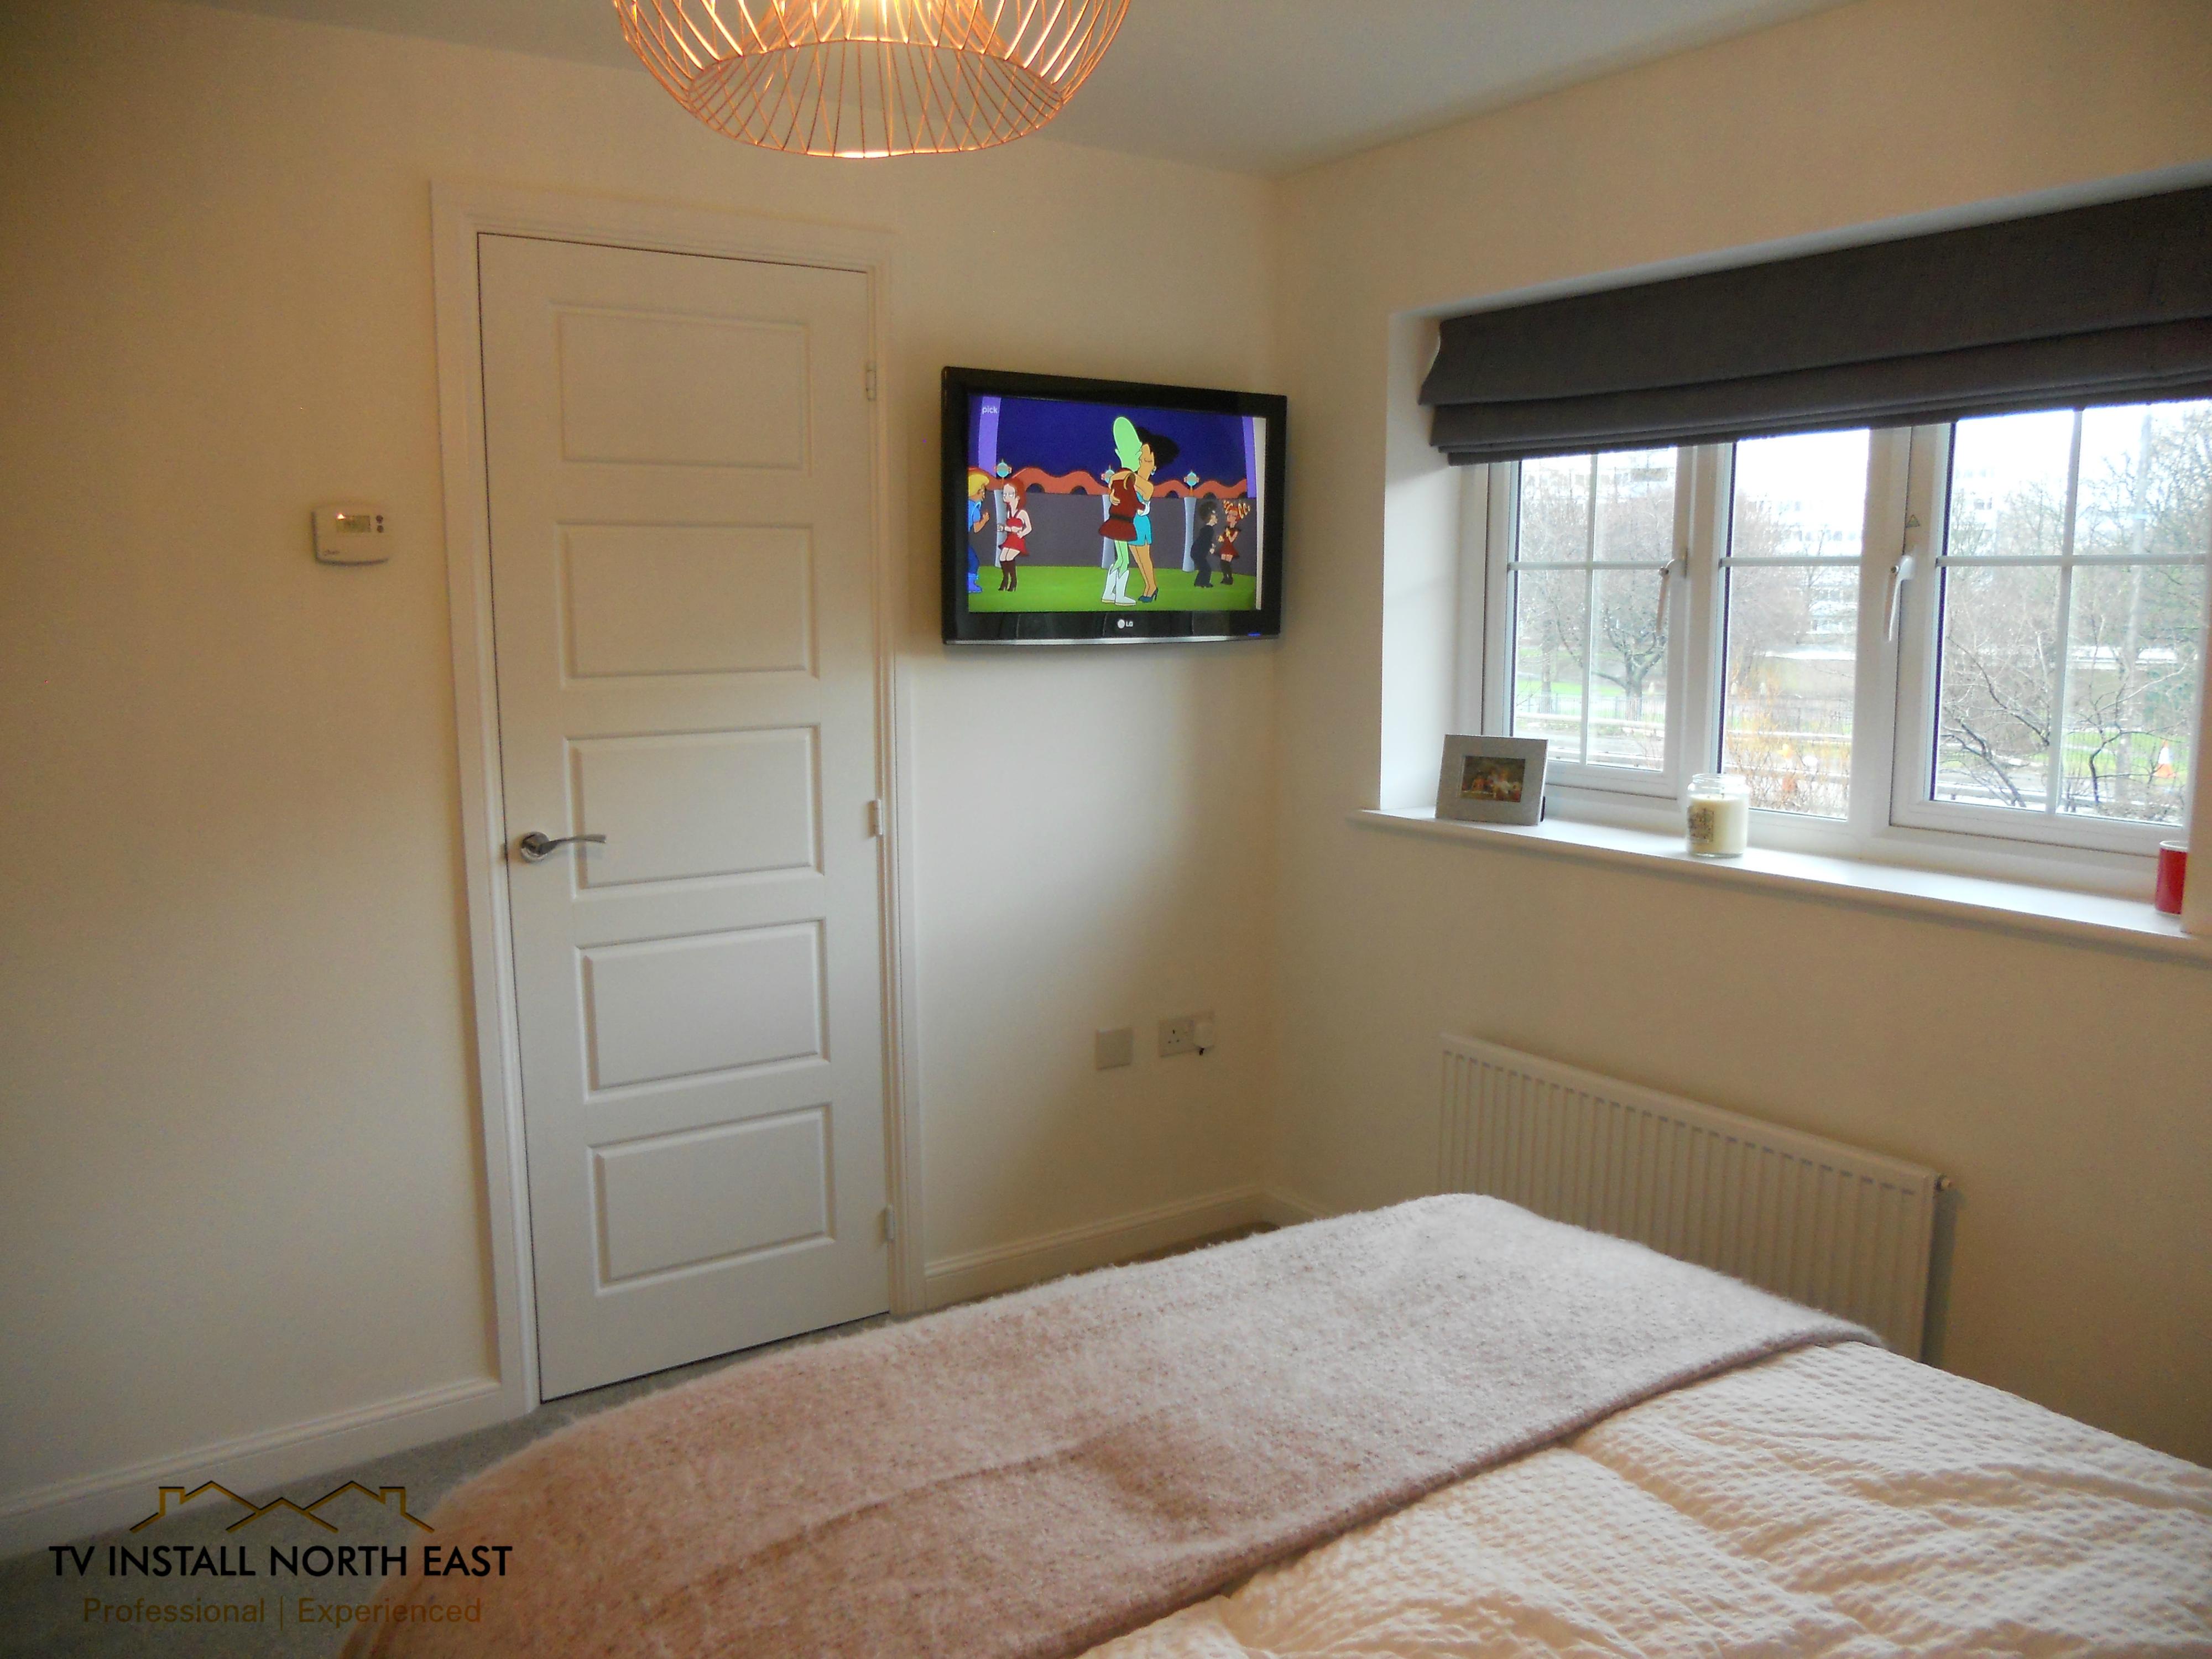 "LG 32"" Bedroom TV"